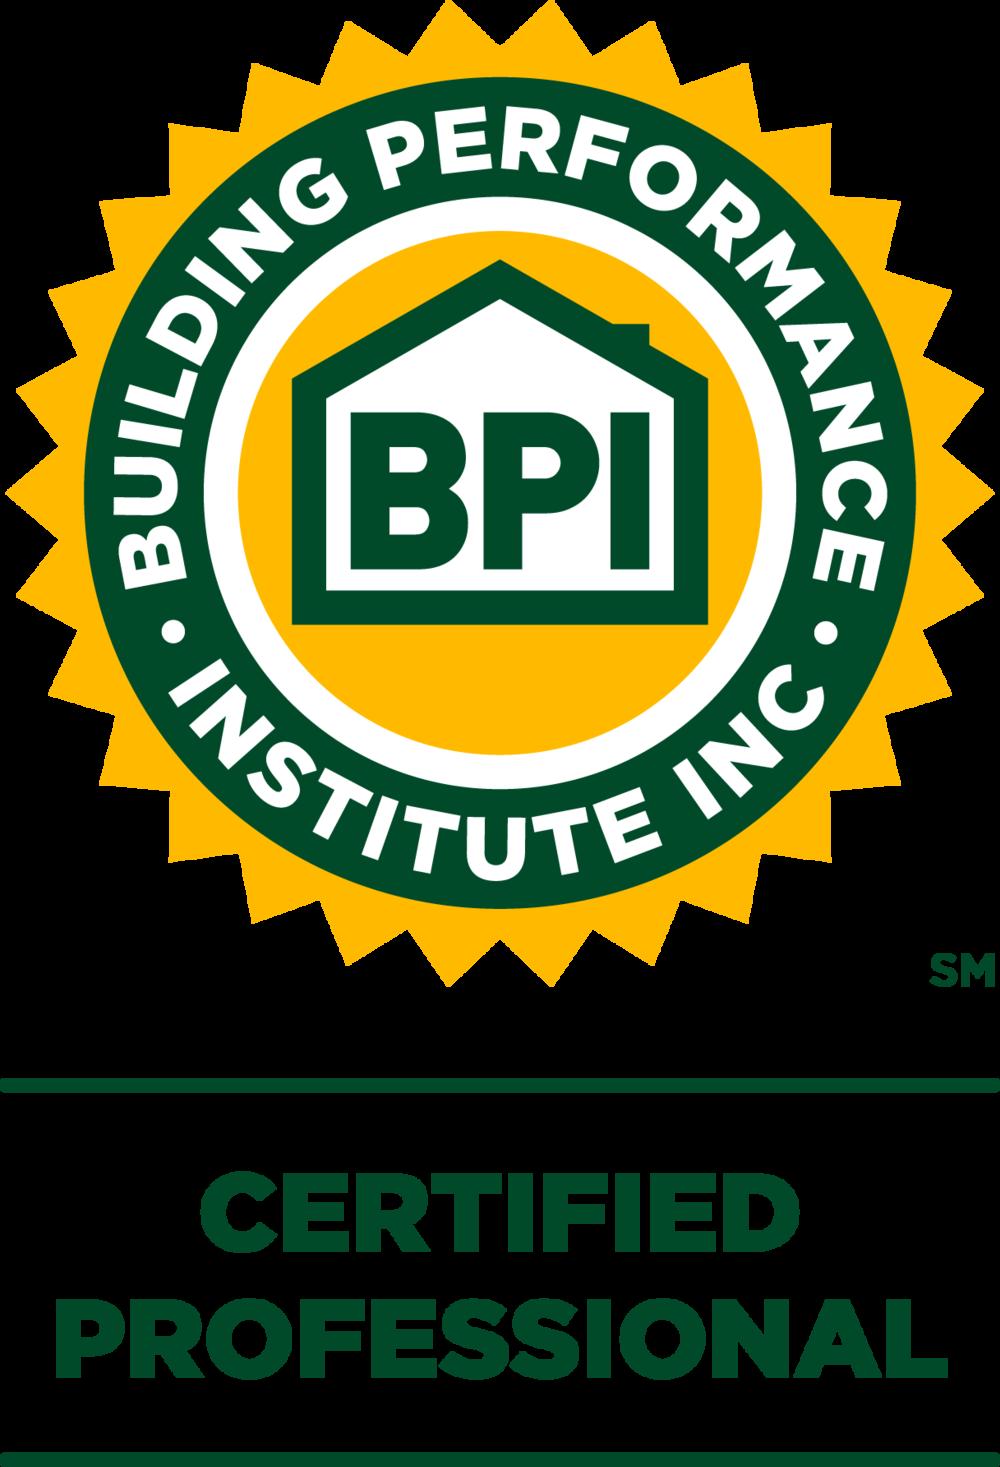 certifiedprofessionalsmrgbv